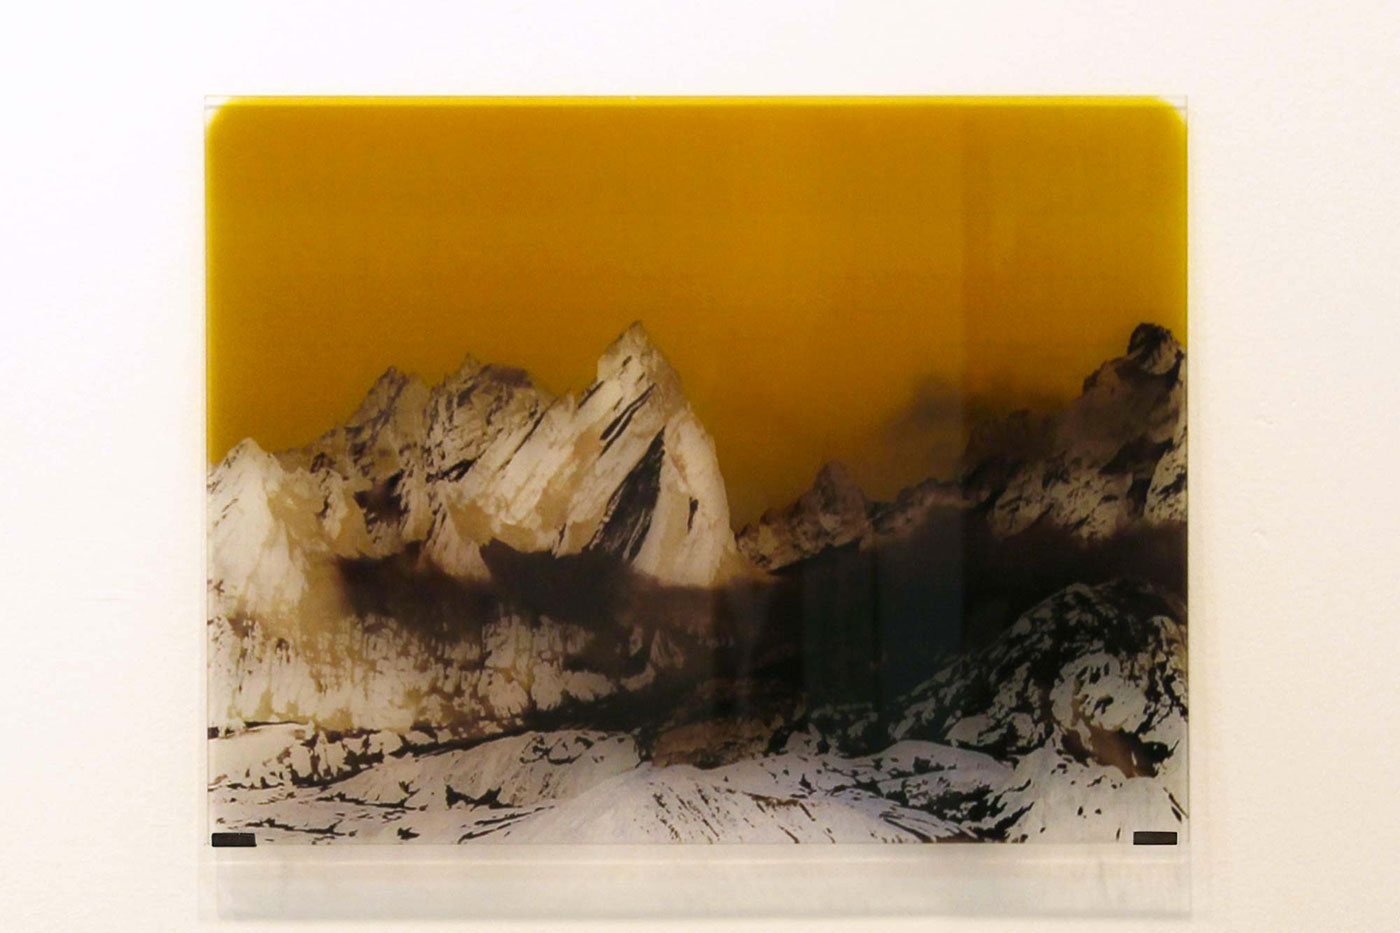 photographic print on glass cm 60 x 45 x 0,4. 2012